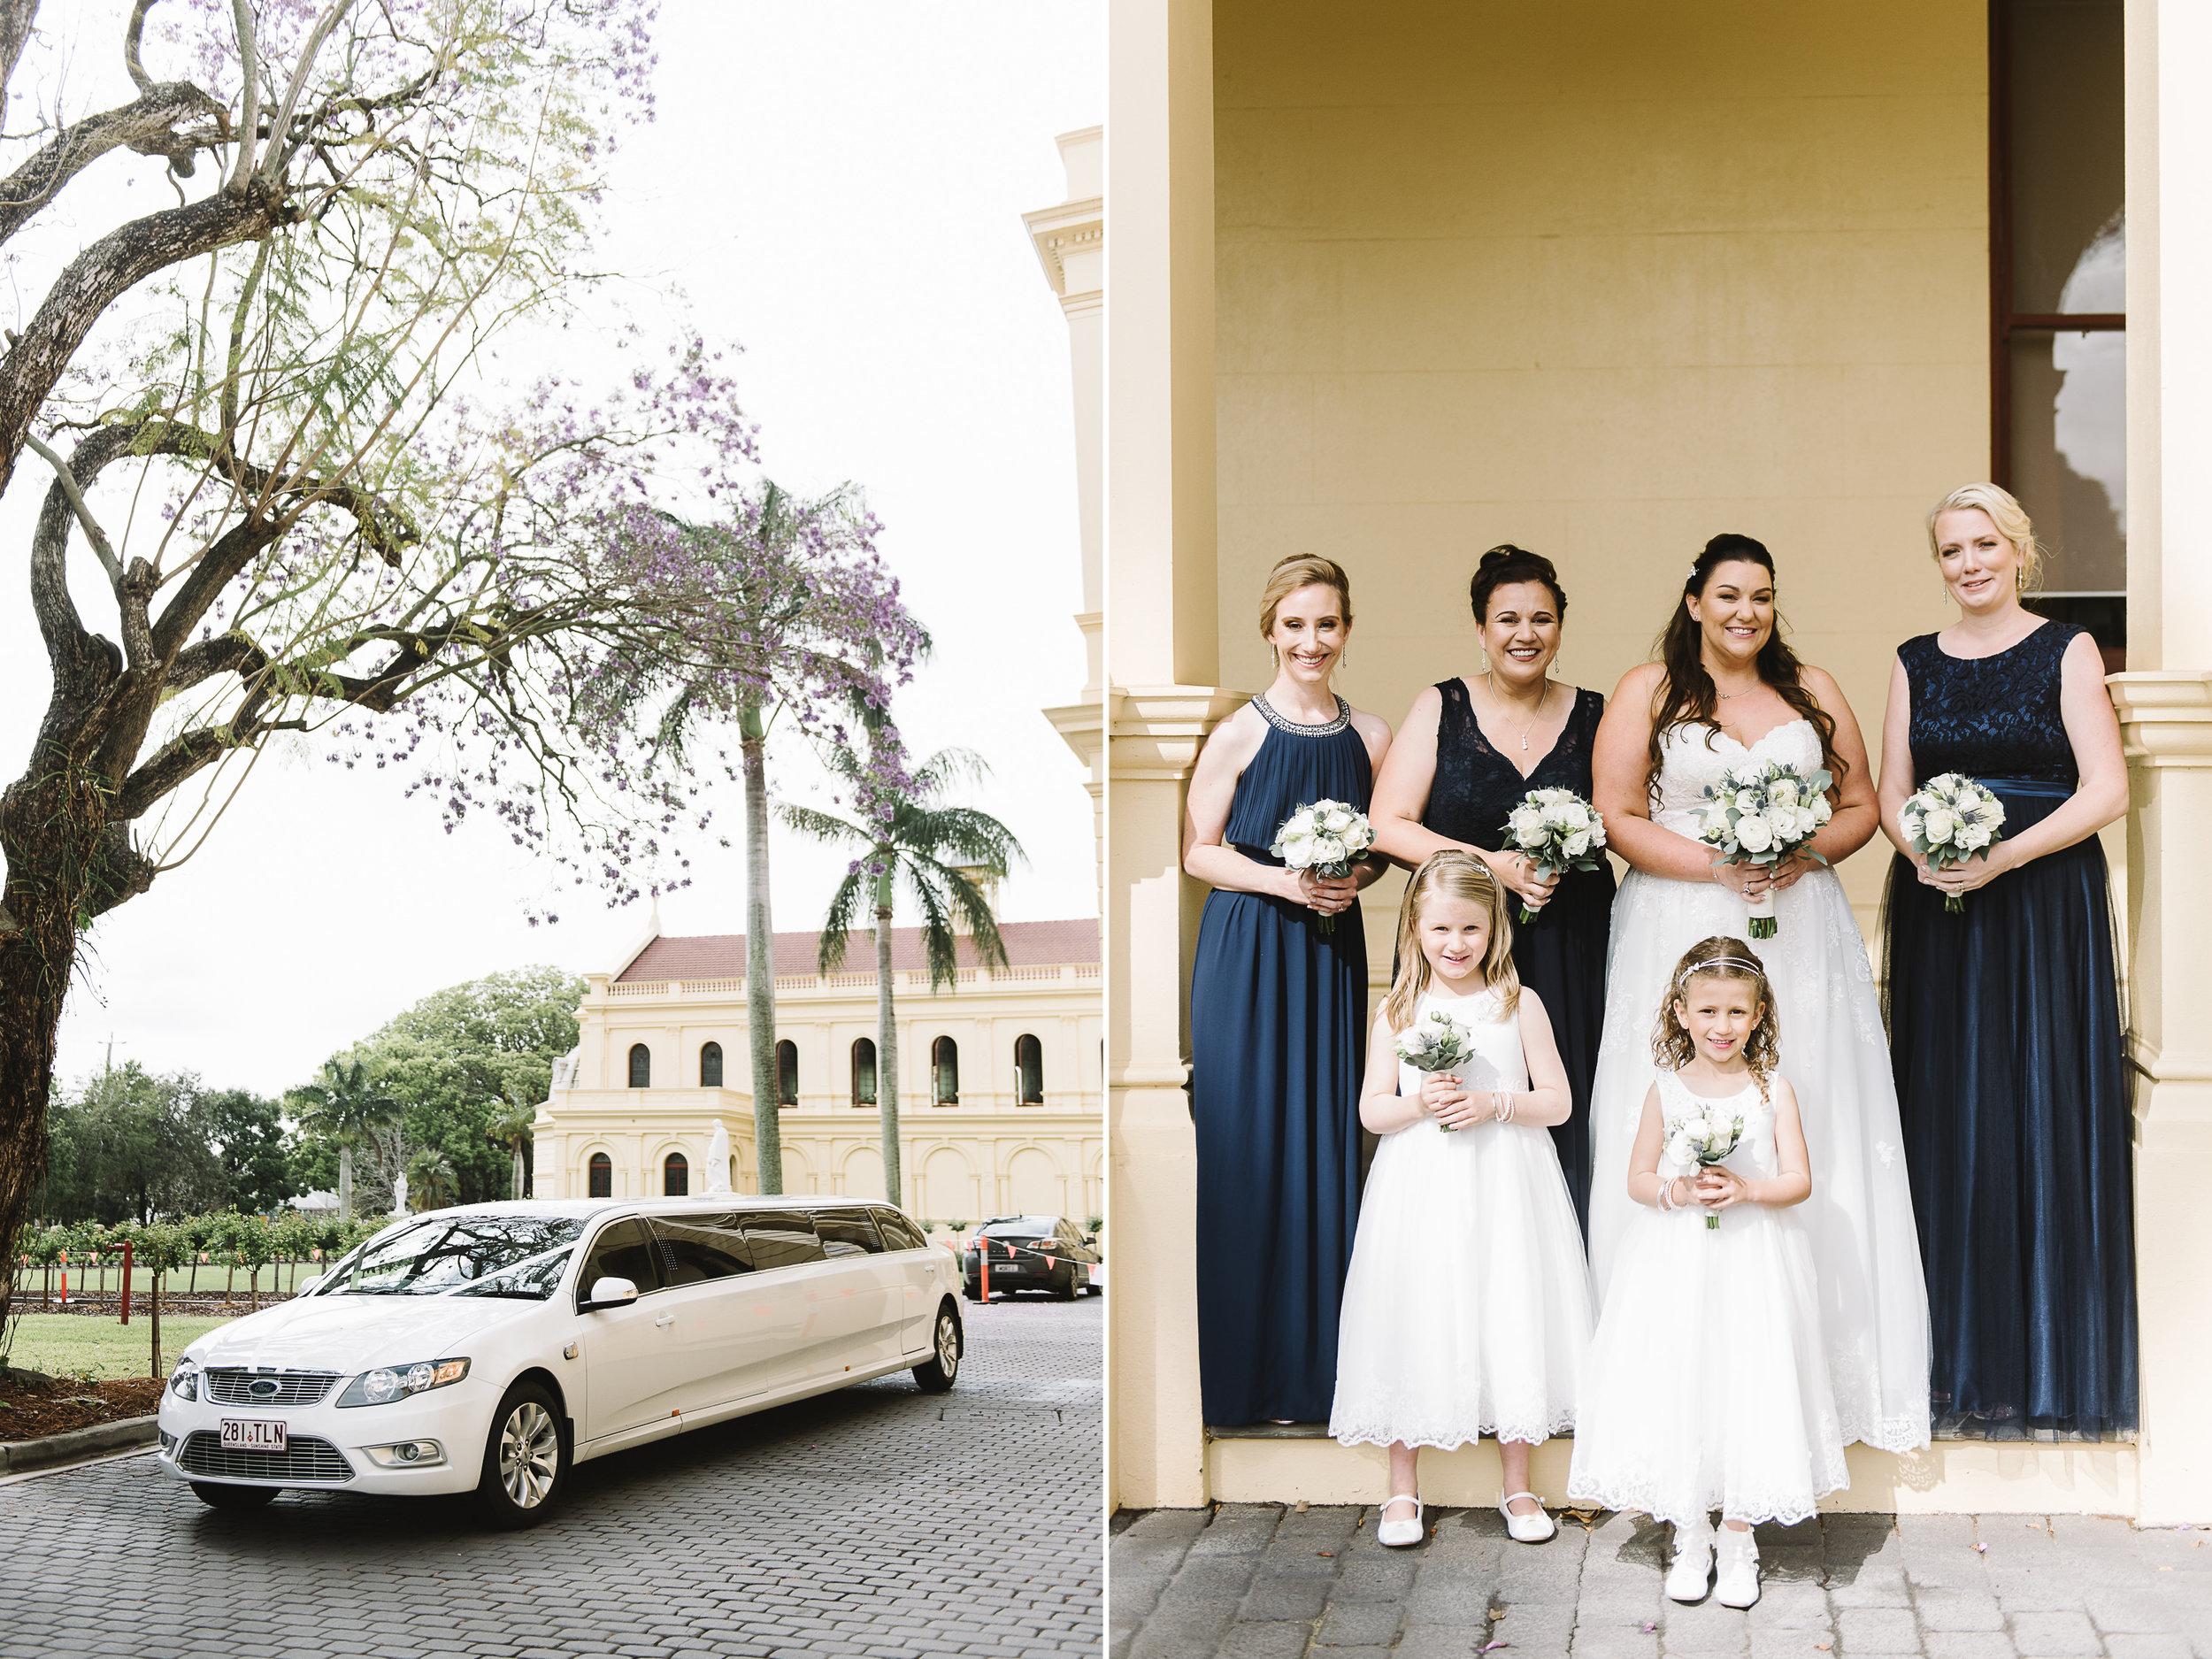 nudgee-college-wedding-13.jpg